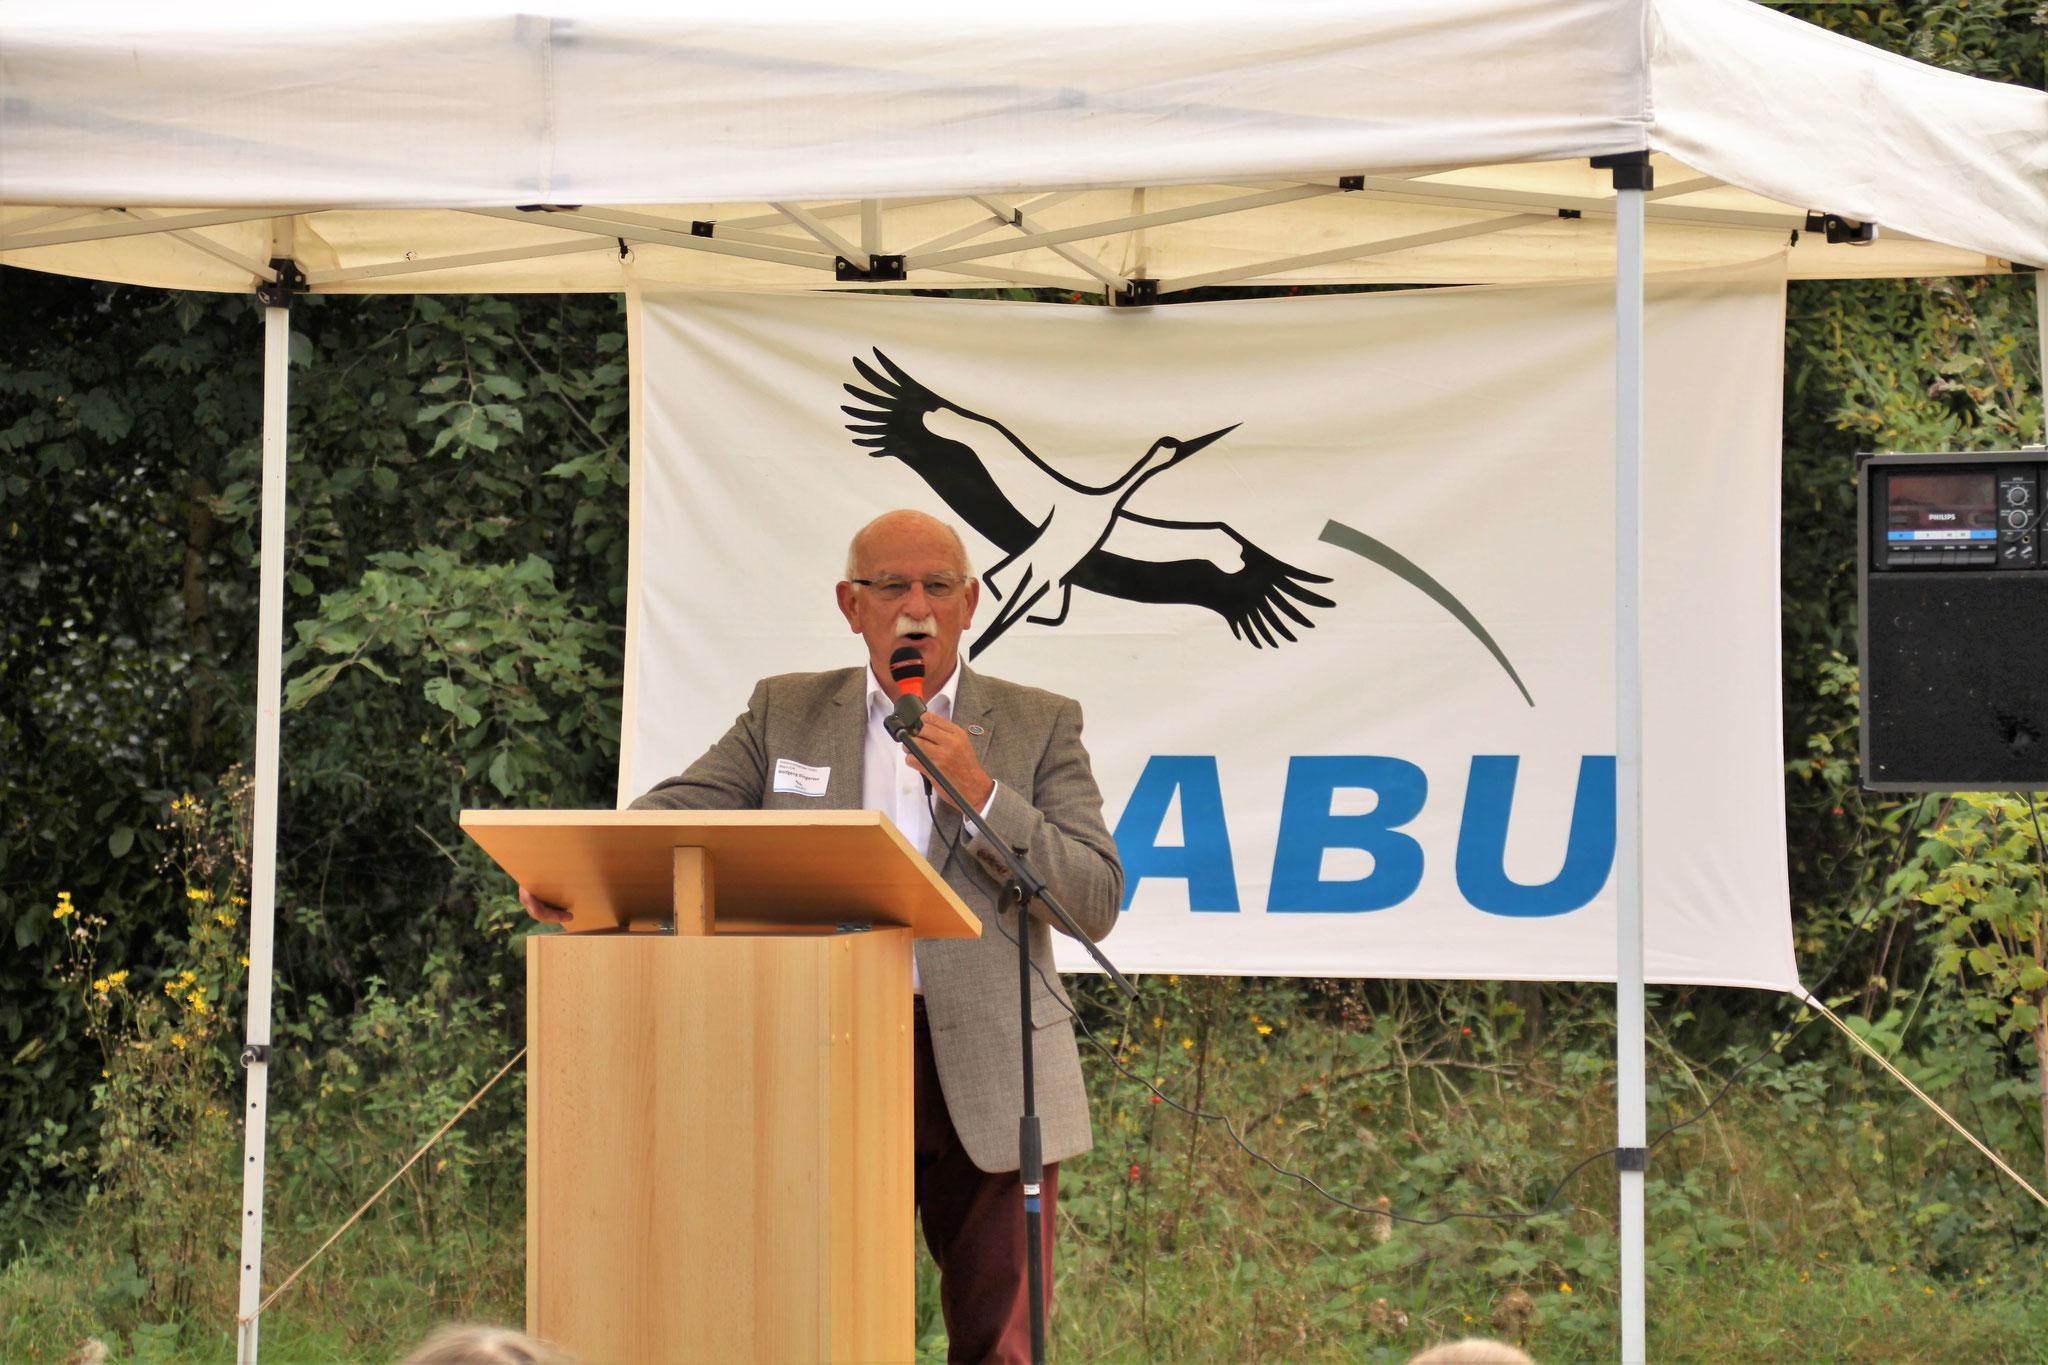 NABU Rhein-Erft Vorsitzender Wolfgang Dingarten moderiert die Jubiläums-Feier.